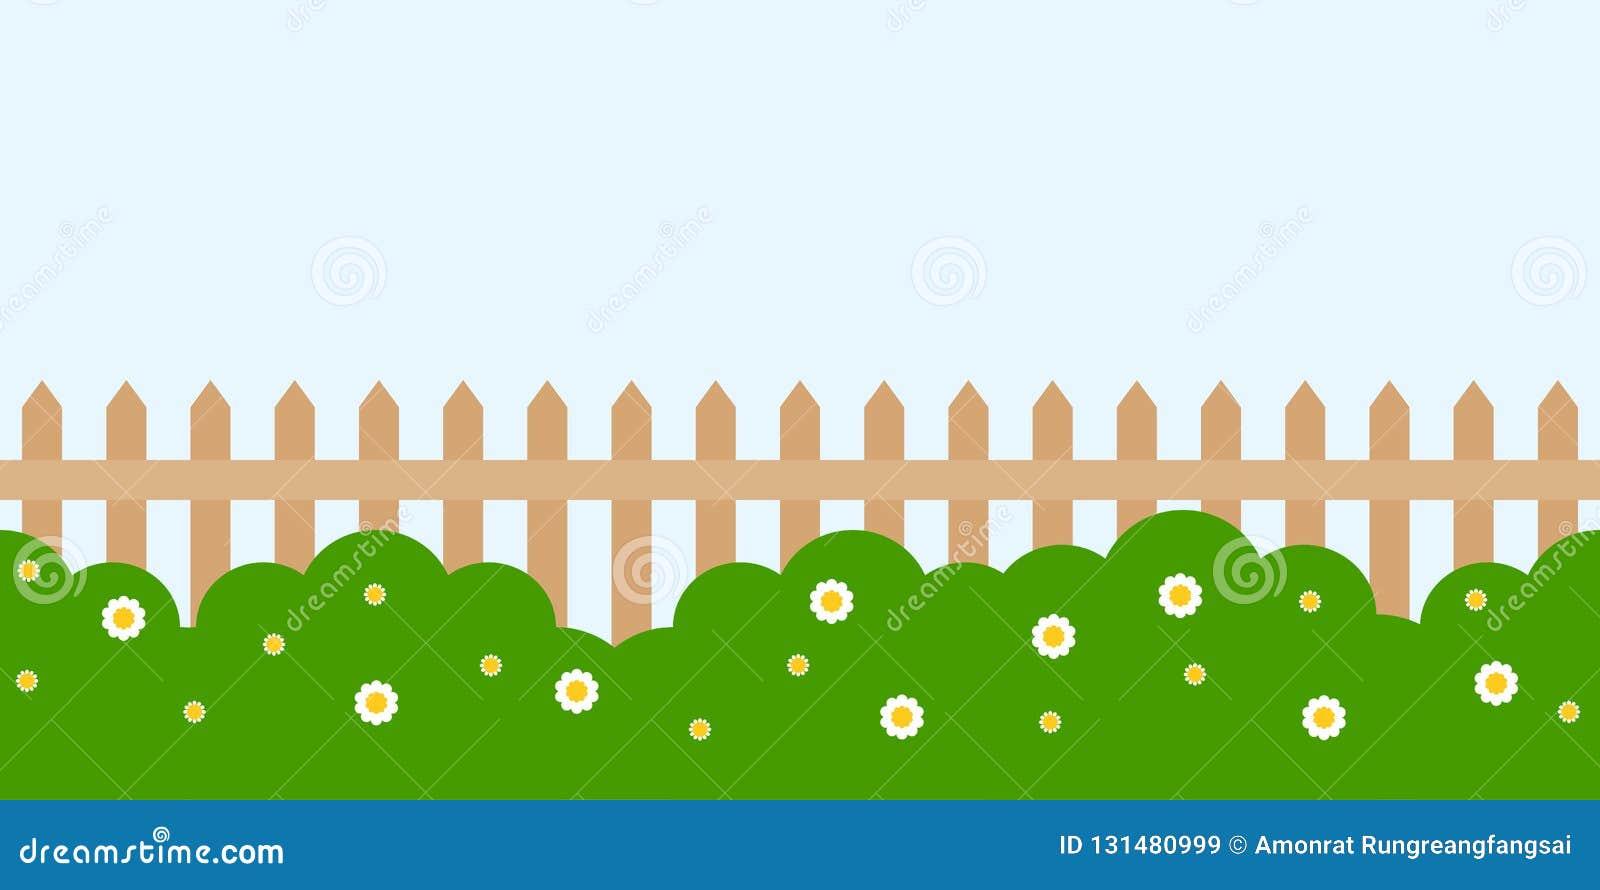 Repeat Background, Garden Landscape Theme Flat Design Stock Vector